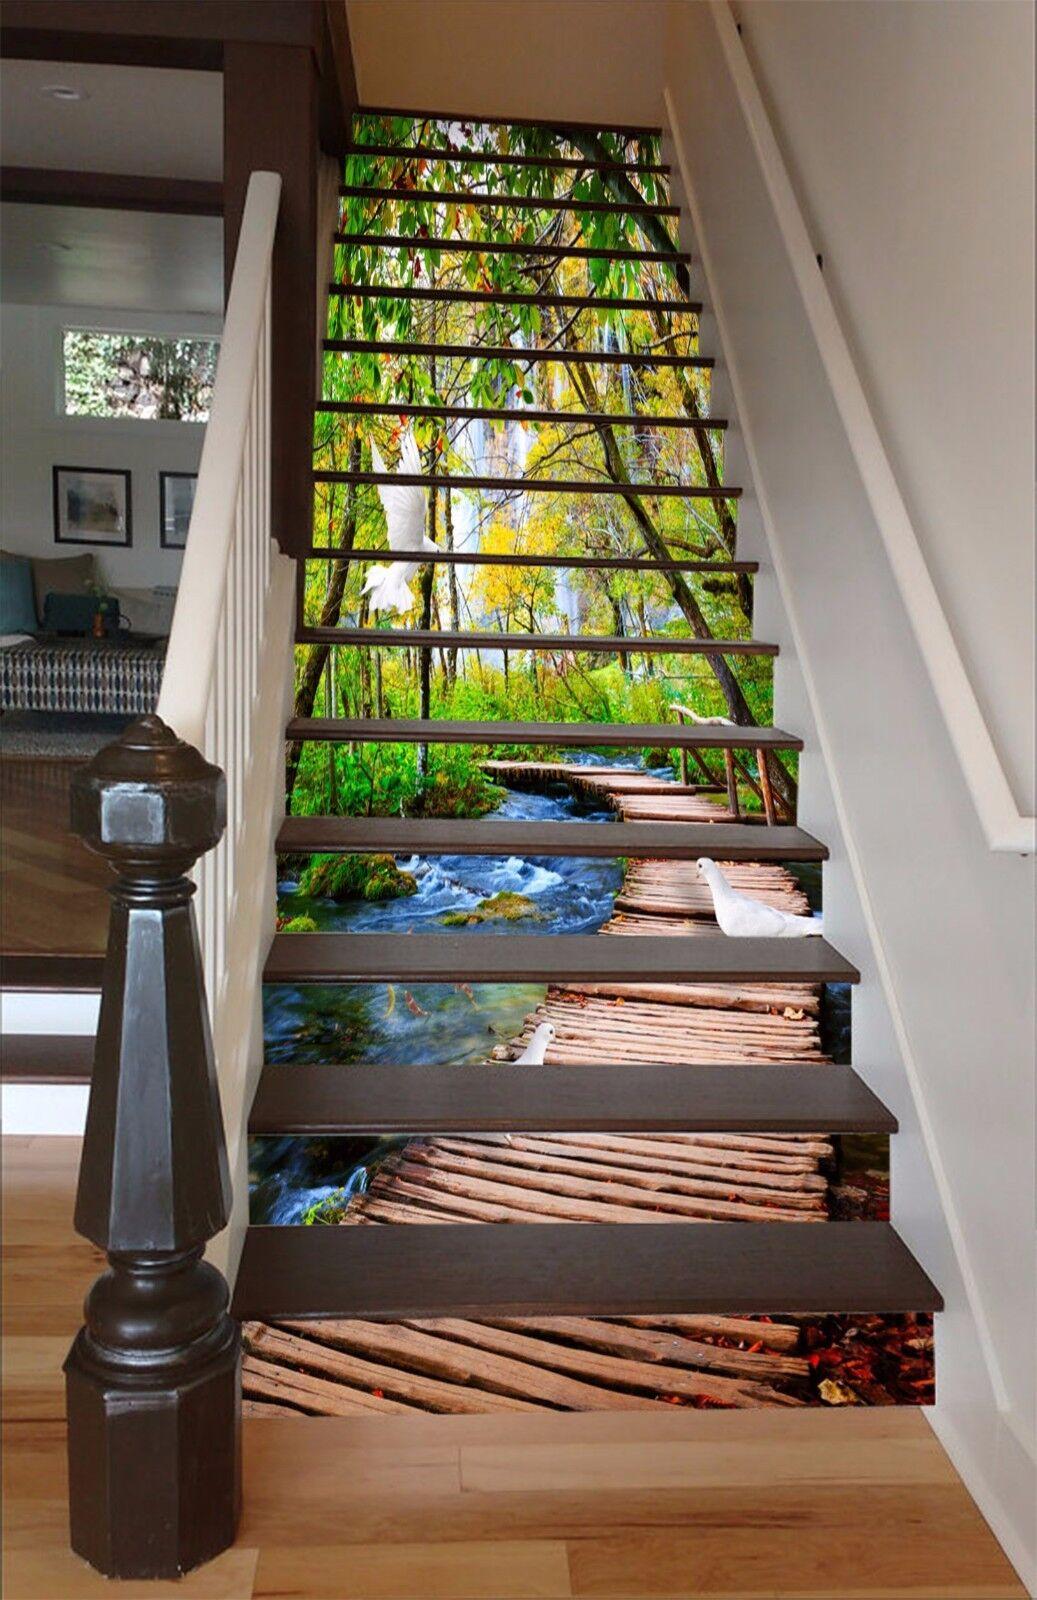 3D Wooden Bridge 98 Stair Risers Decoration Photo Mural Vinyl Decal Wallpaper AU